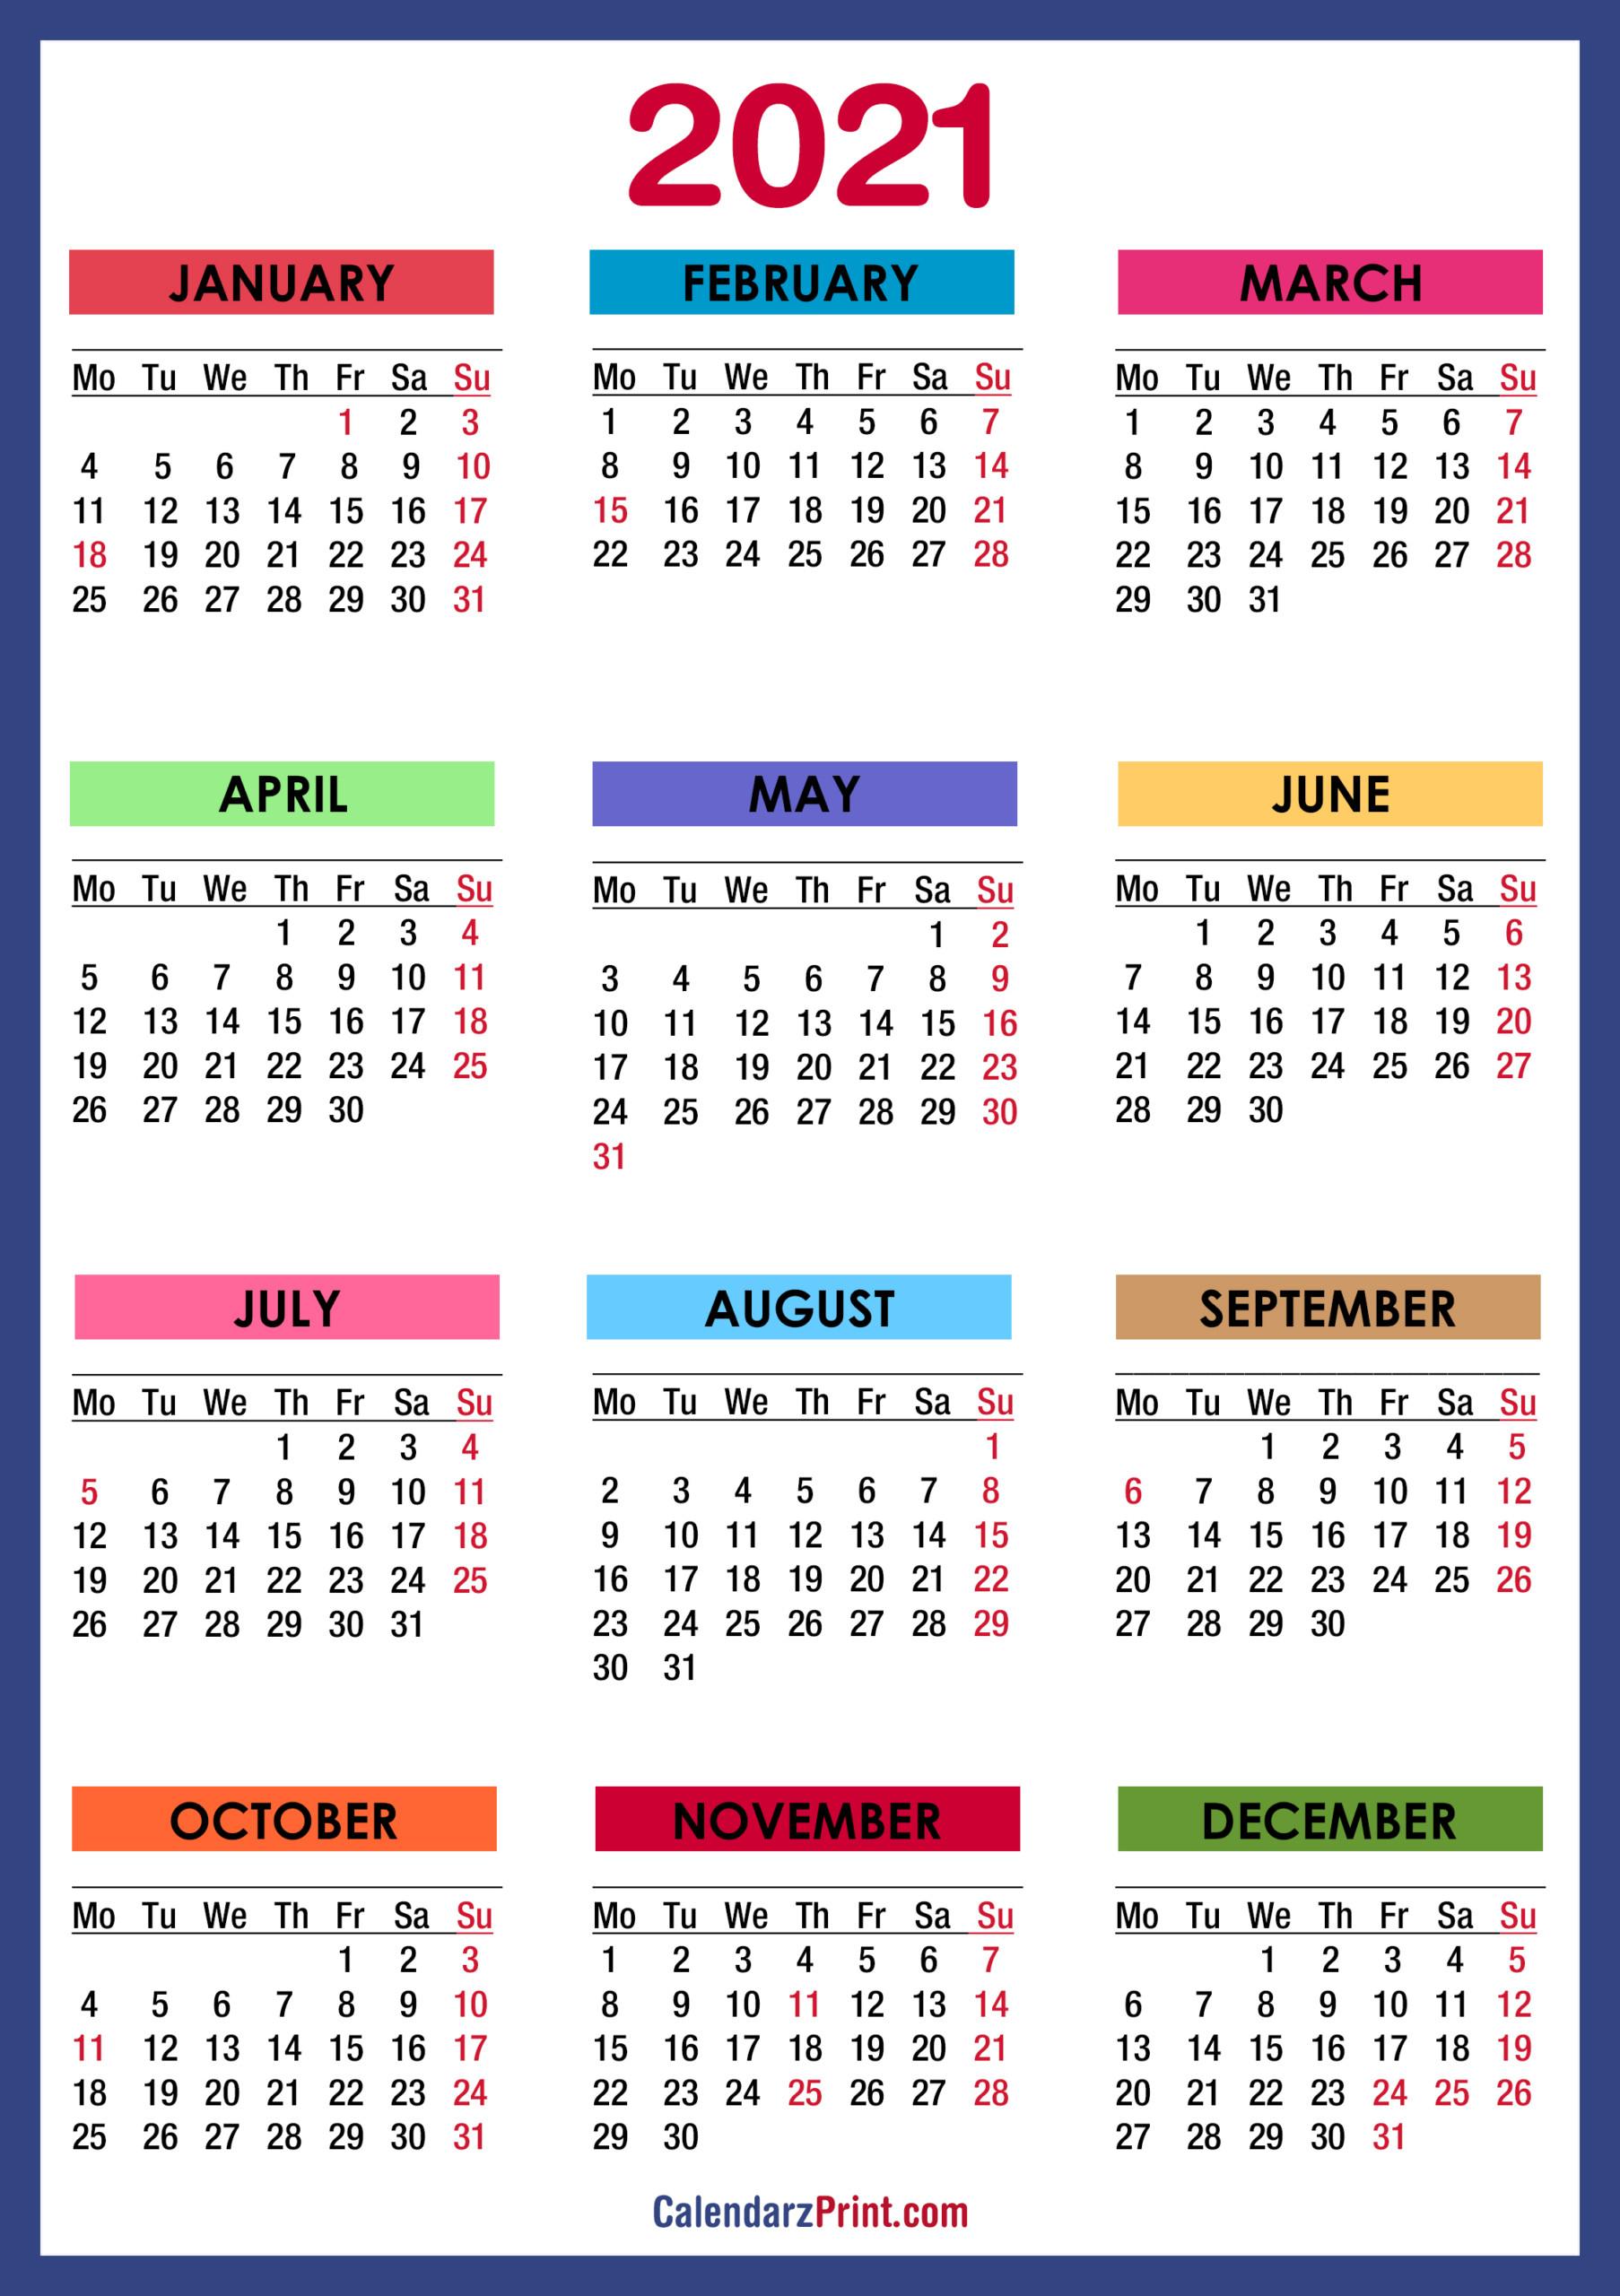 2021 Calendar With Us Holidays Printable Pdf 2021